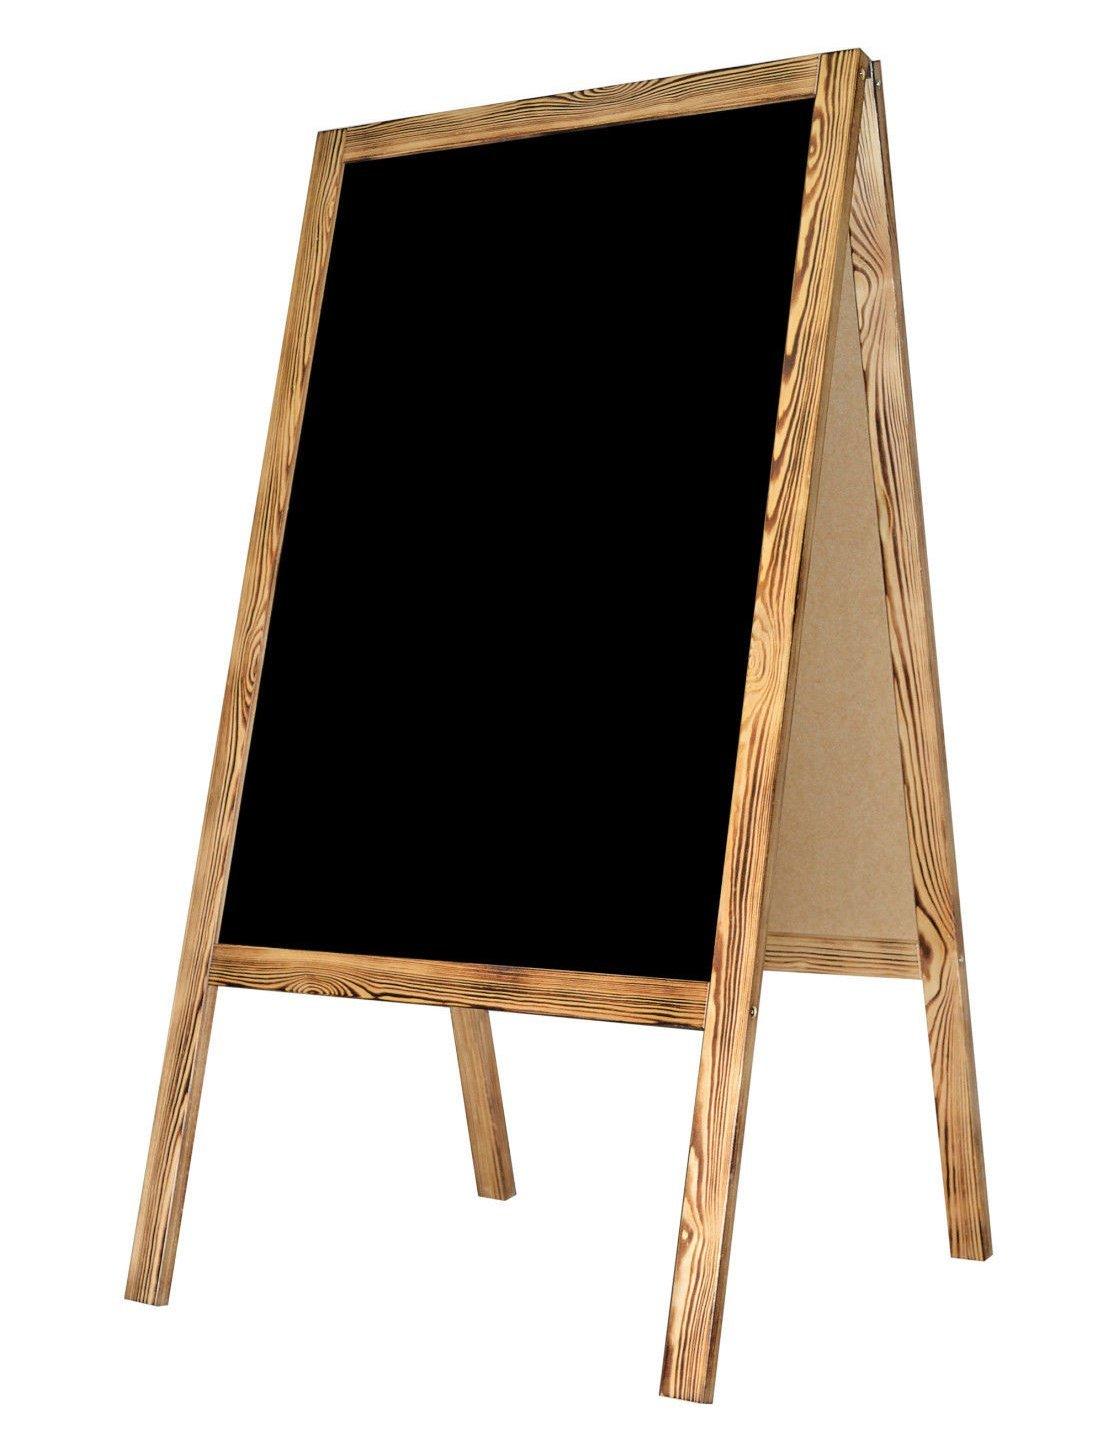 Kundenstopper Holz Tafel Werbung Kreidetafel Aufsteller Werbetafel Holztafel Werbeaufsteller Straßenständer Gehsteig Holztafel A-Tafel - BURN DWA